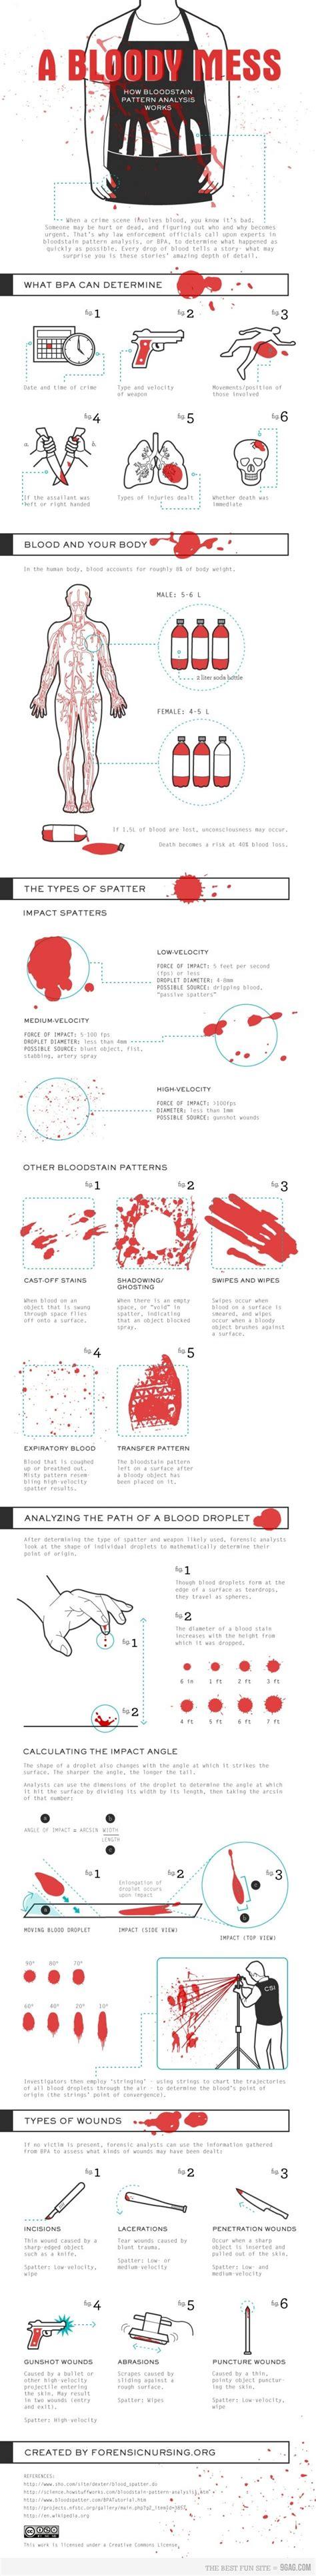 how bloodstain pattern analysis works 3 ways to escape zip ties rebrn com